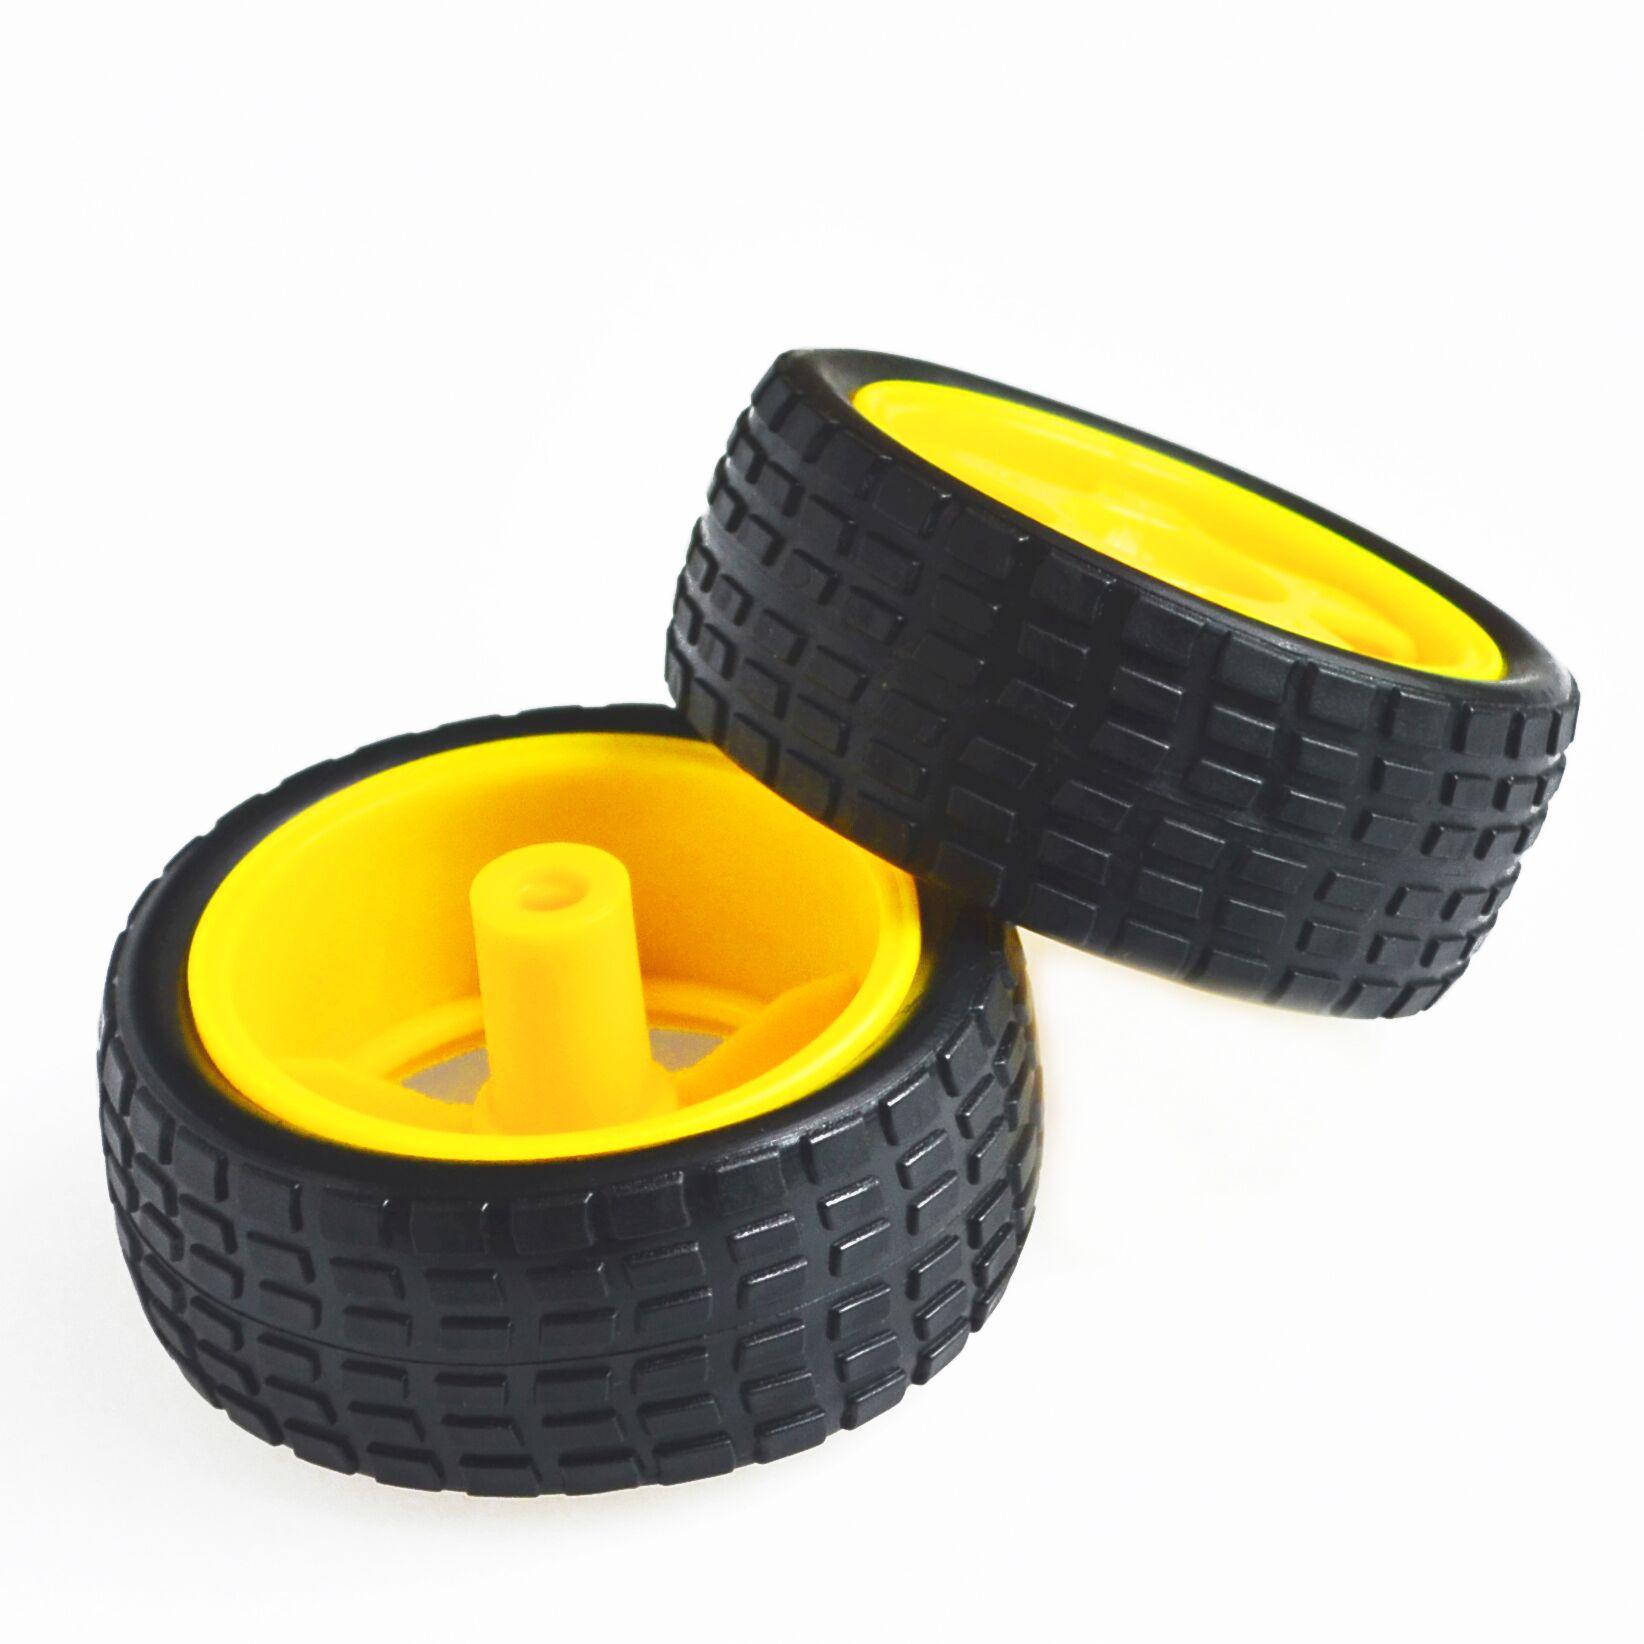 Опорные шины